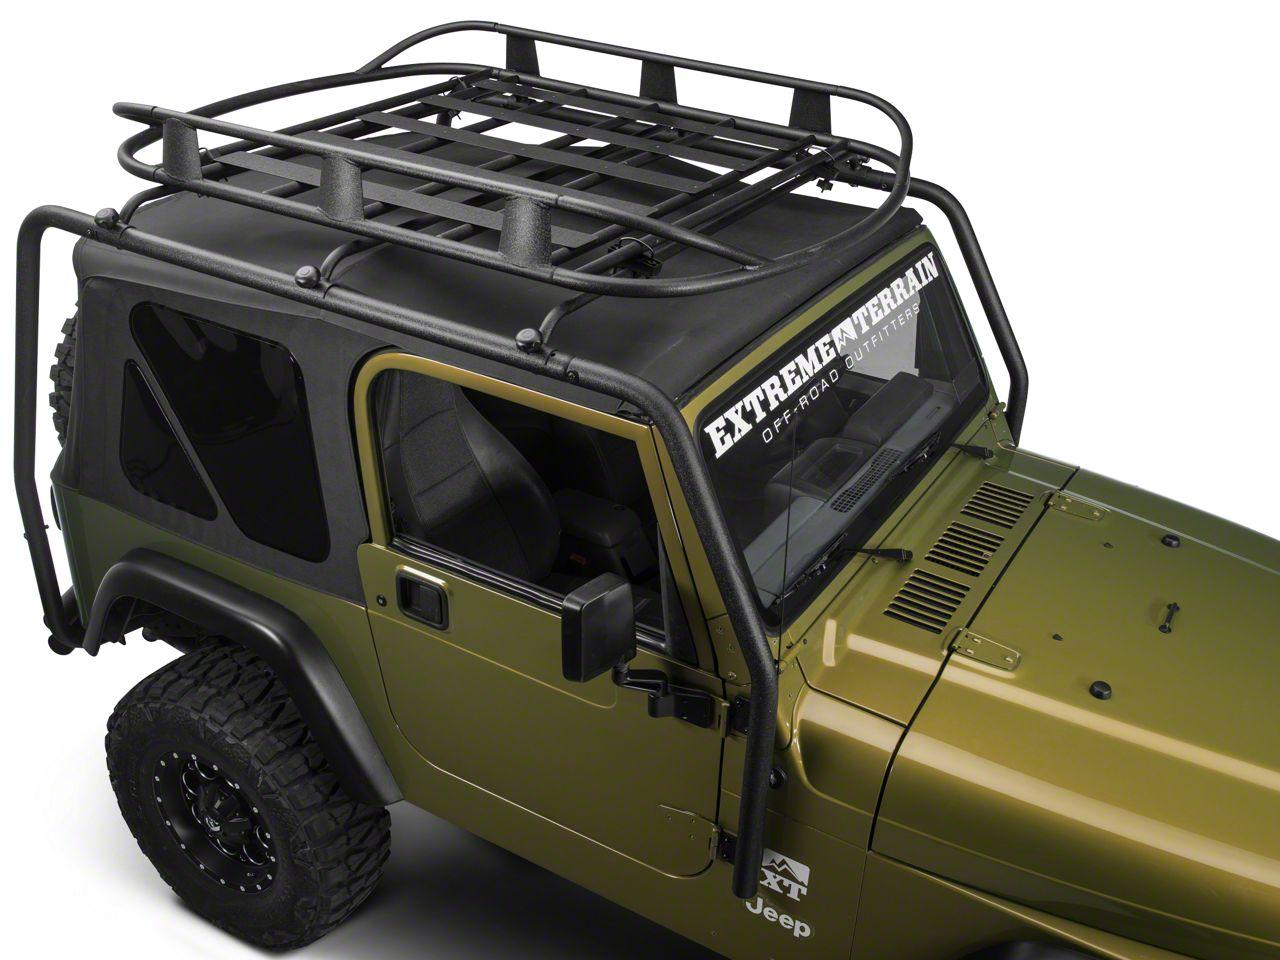 Barricade Jeep Wrangler Roof Rack Basket Textured Black J100175b 87 06 Jeep Wrangler Yj Tj